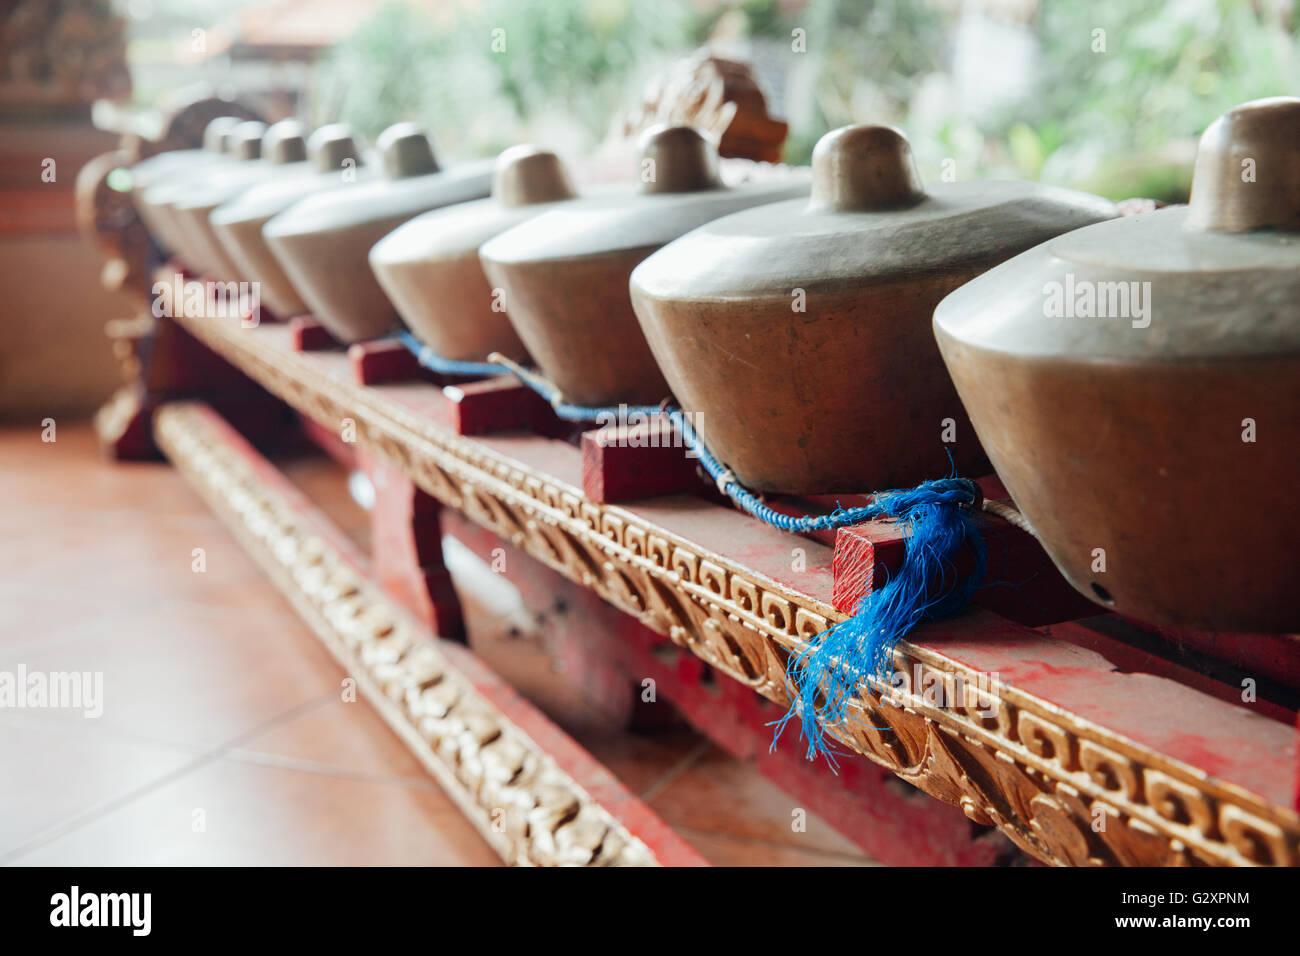 "Traditional balinese percussive music instruments instruments for ""Gamelan"" ensemble music, Ubud, Bali, Indonesia. Stock Photo"